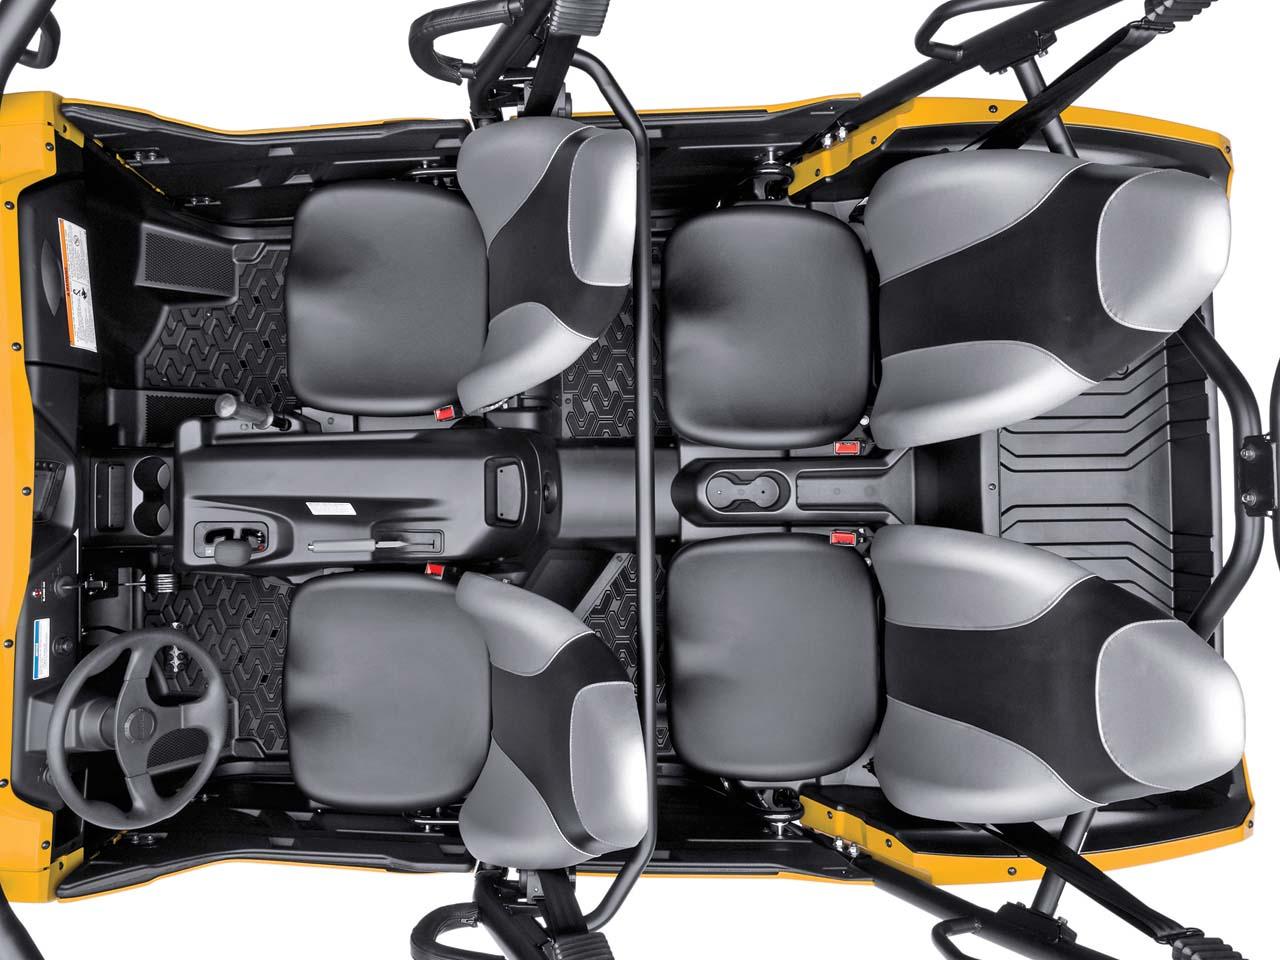 2012 kawasaki teryx 4 750 4x4 review | atv illustrated